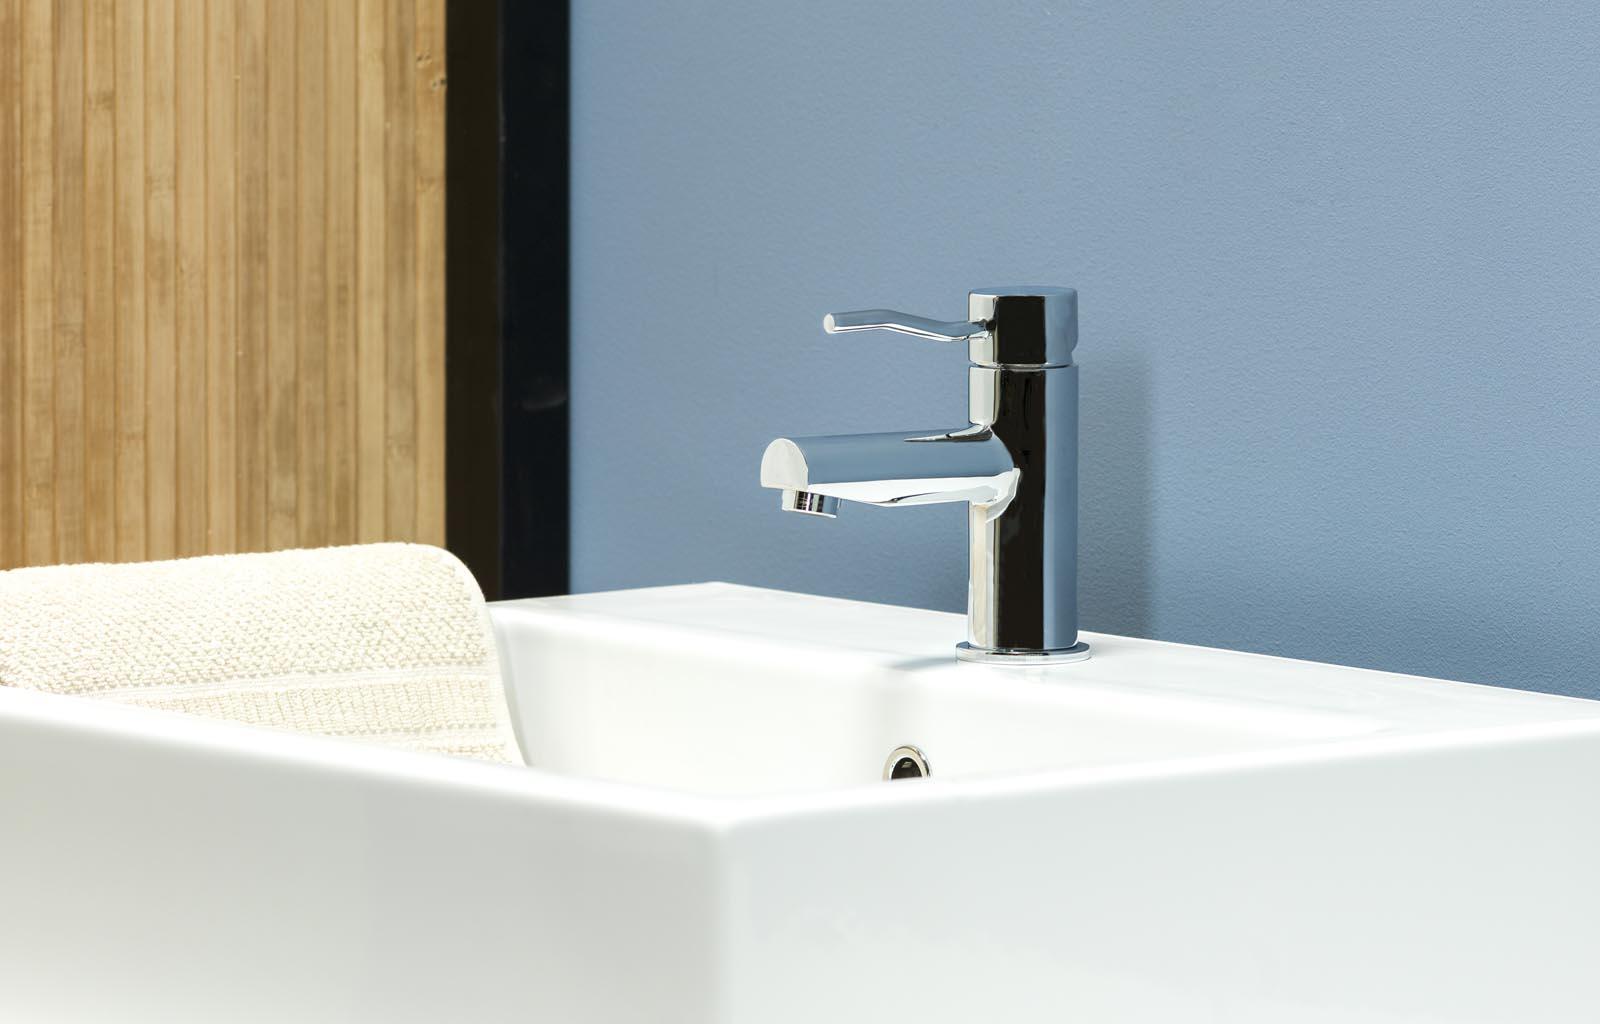 Kusasi bathroom design malta for Bathroom design malta